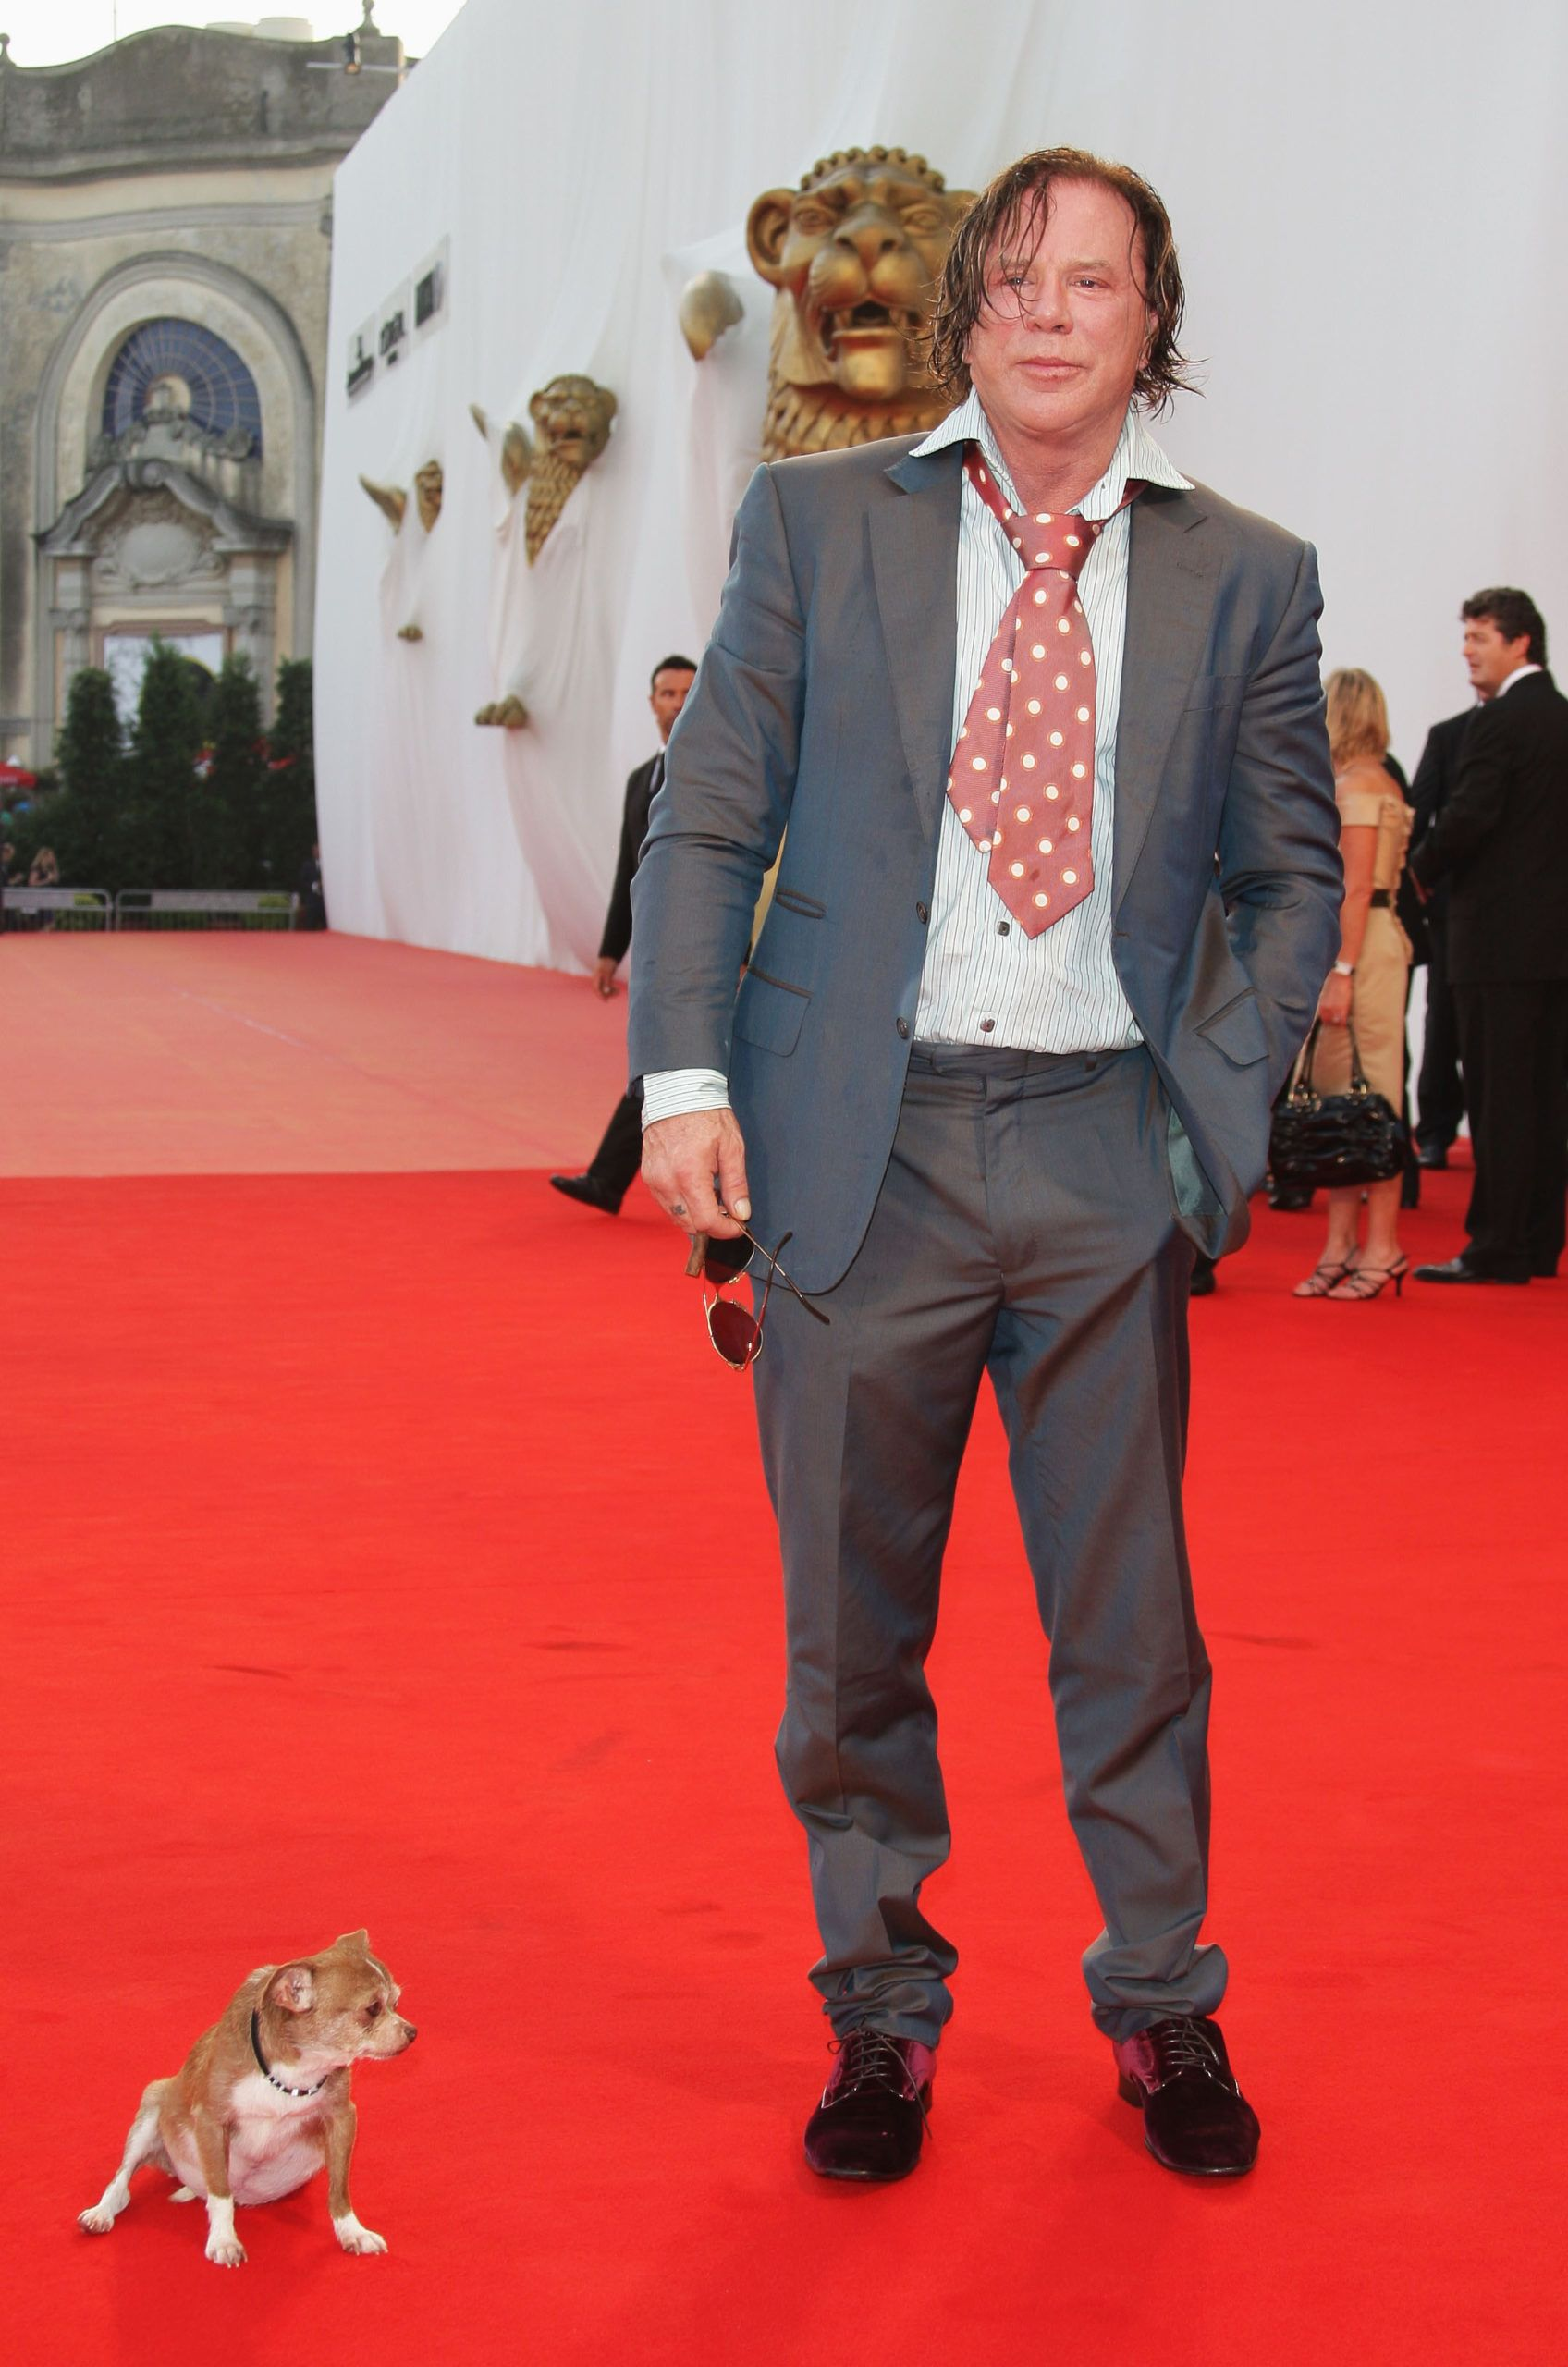 Mickey Rourke a velencei vörös szőnyegre is vitte magával Lokit (Photo by Daniele Venturelli/WireImage)